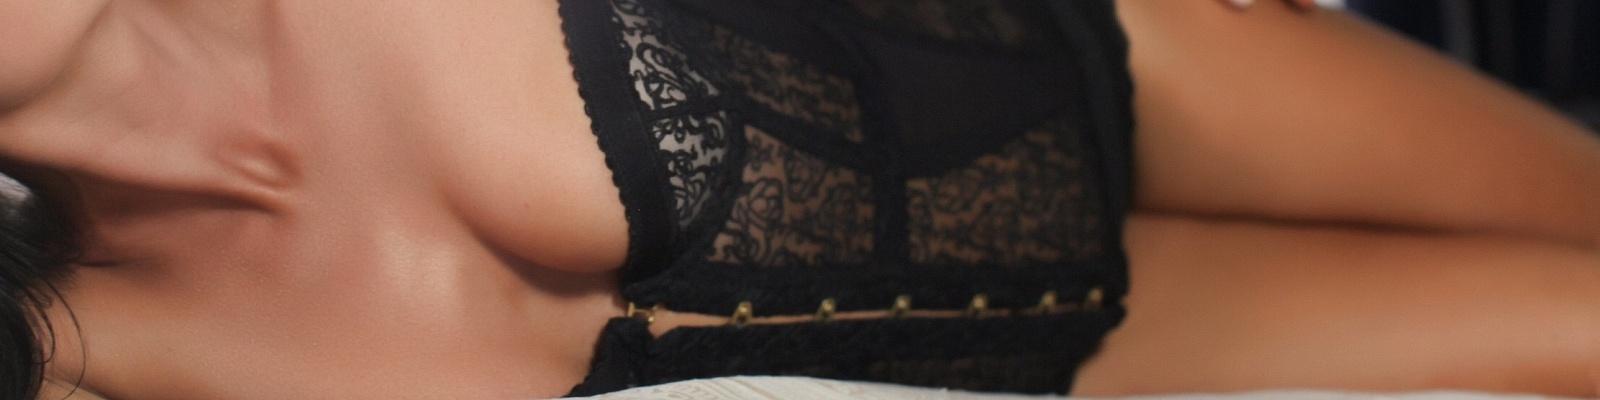 Monika Bellochi's Cover Photo